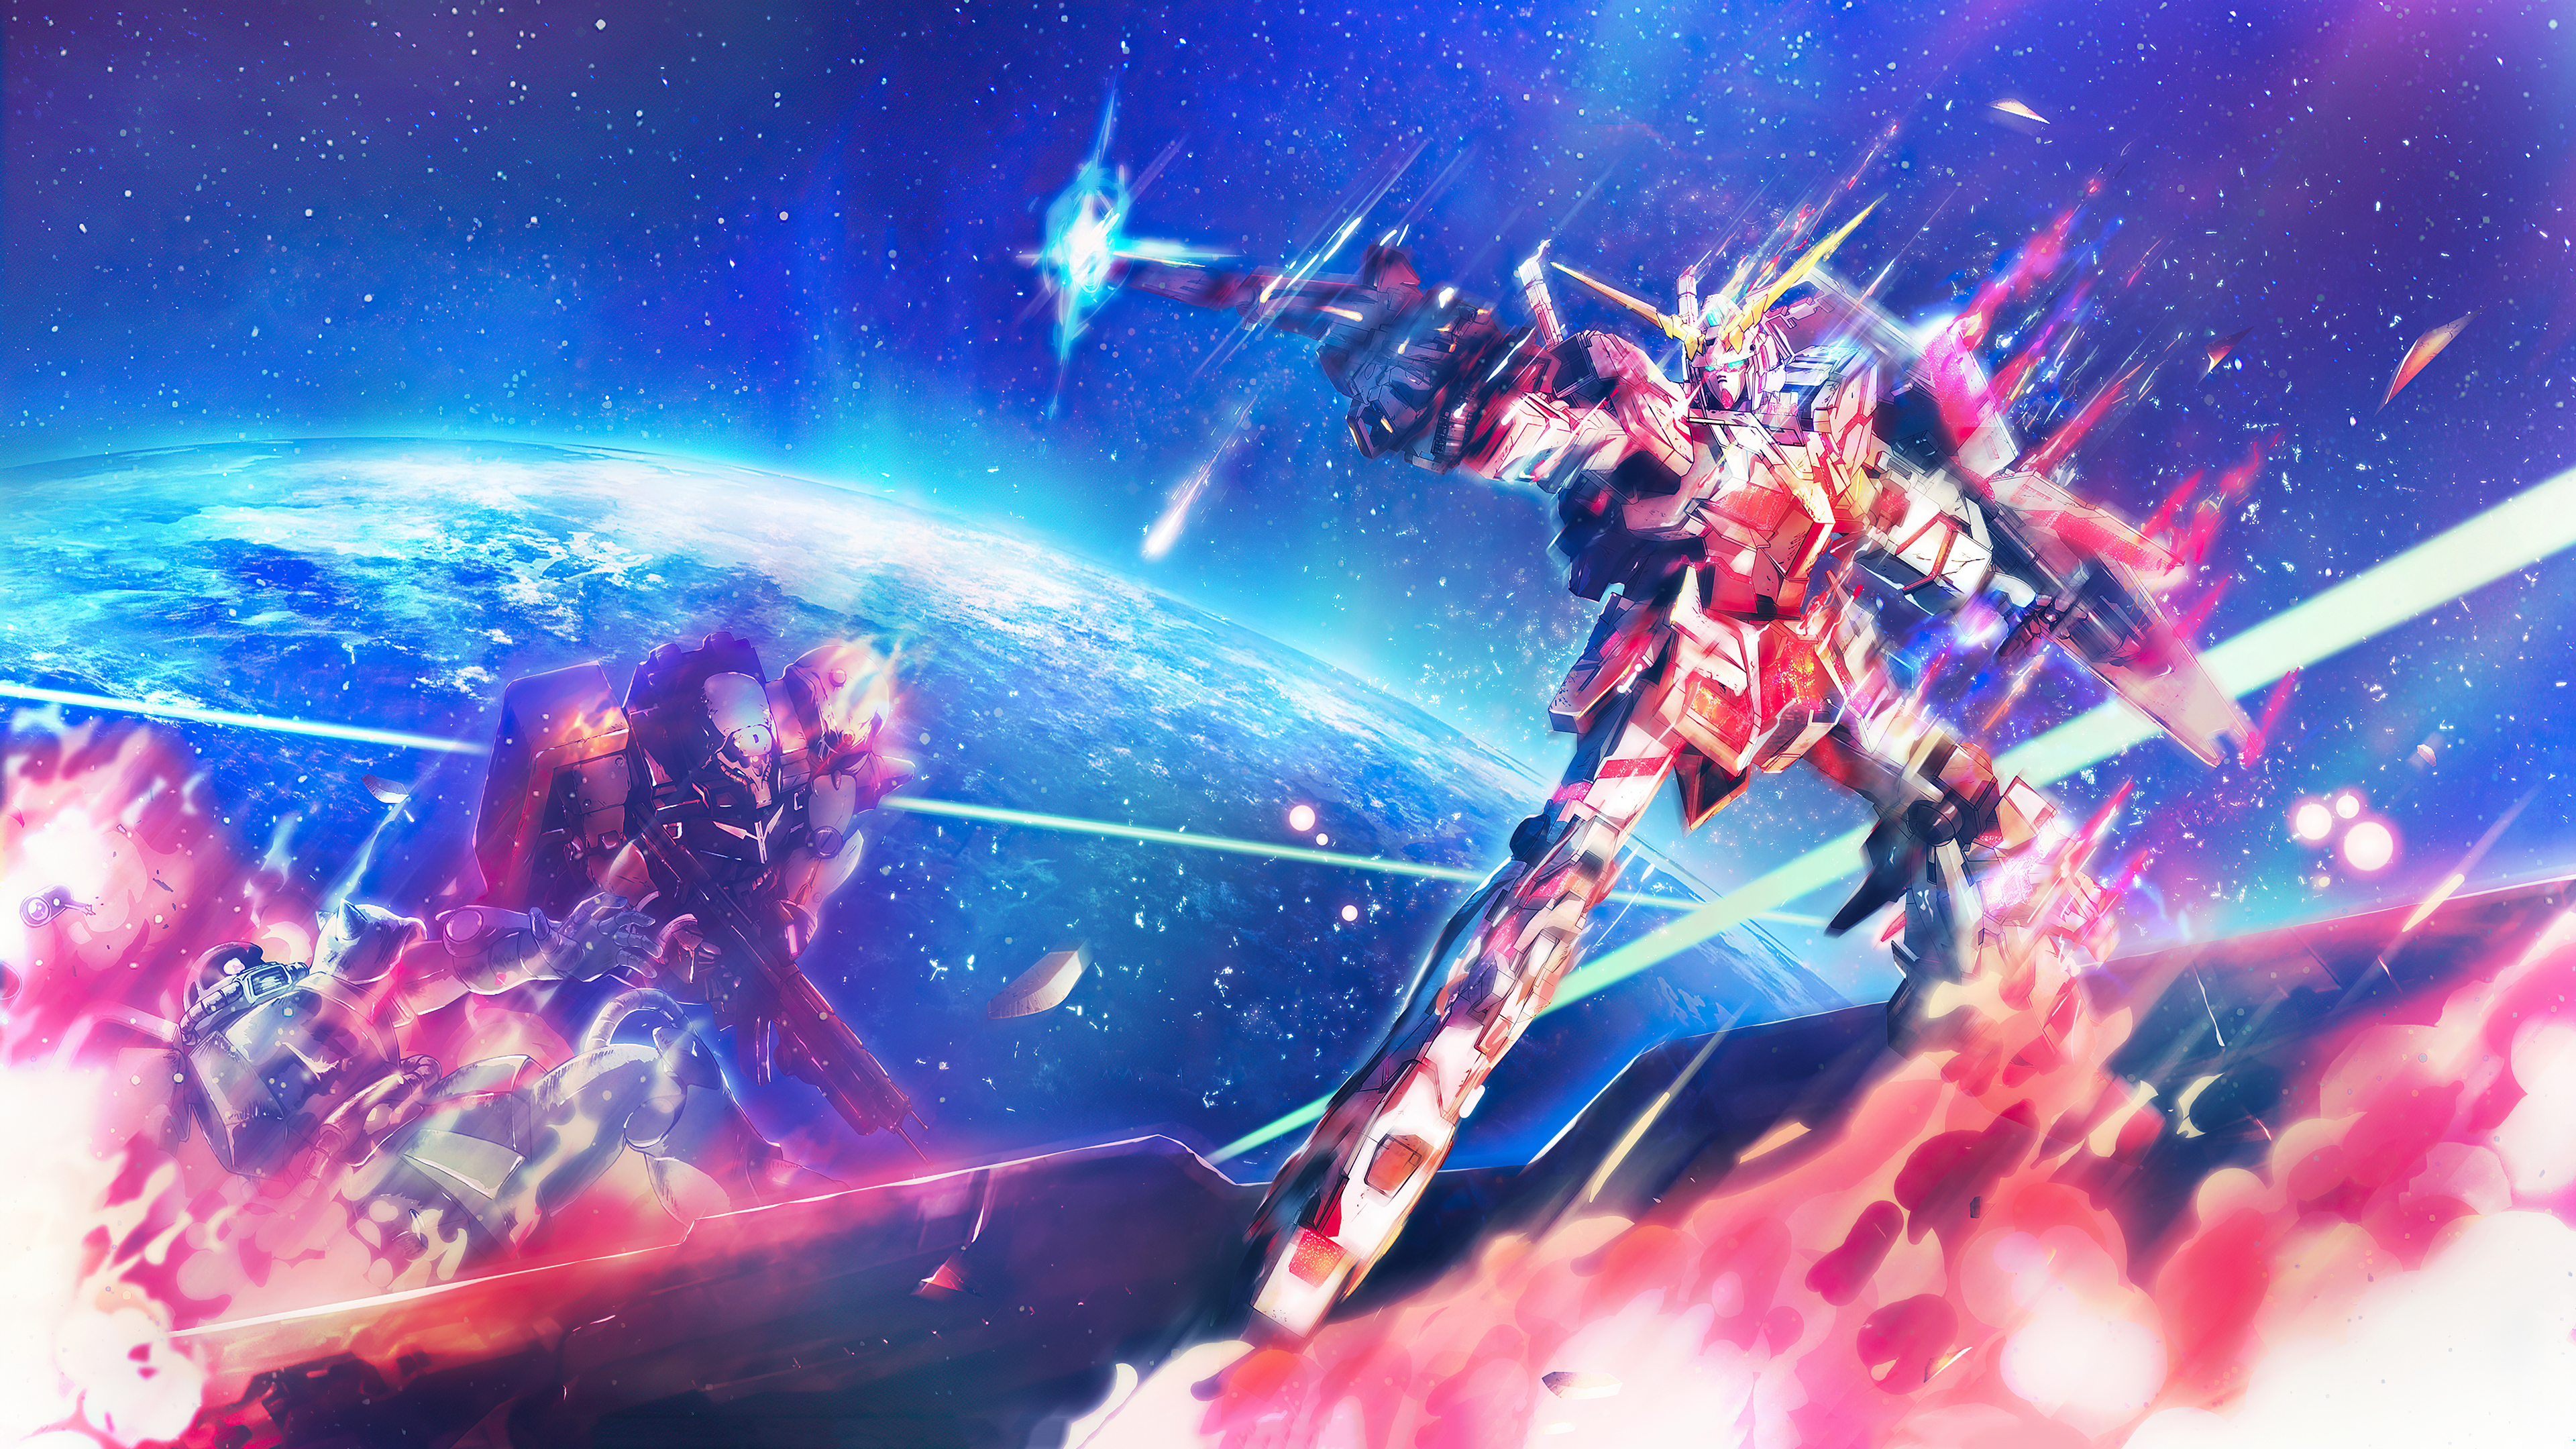 mobile suit gundam unicorn anime 1596921633 - Mobile Suit Gundam Unicorn Anime -